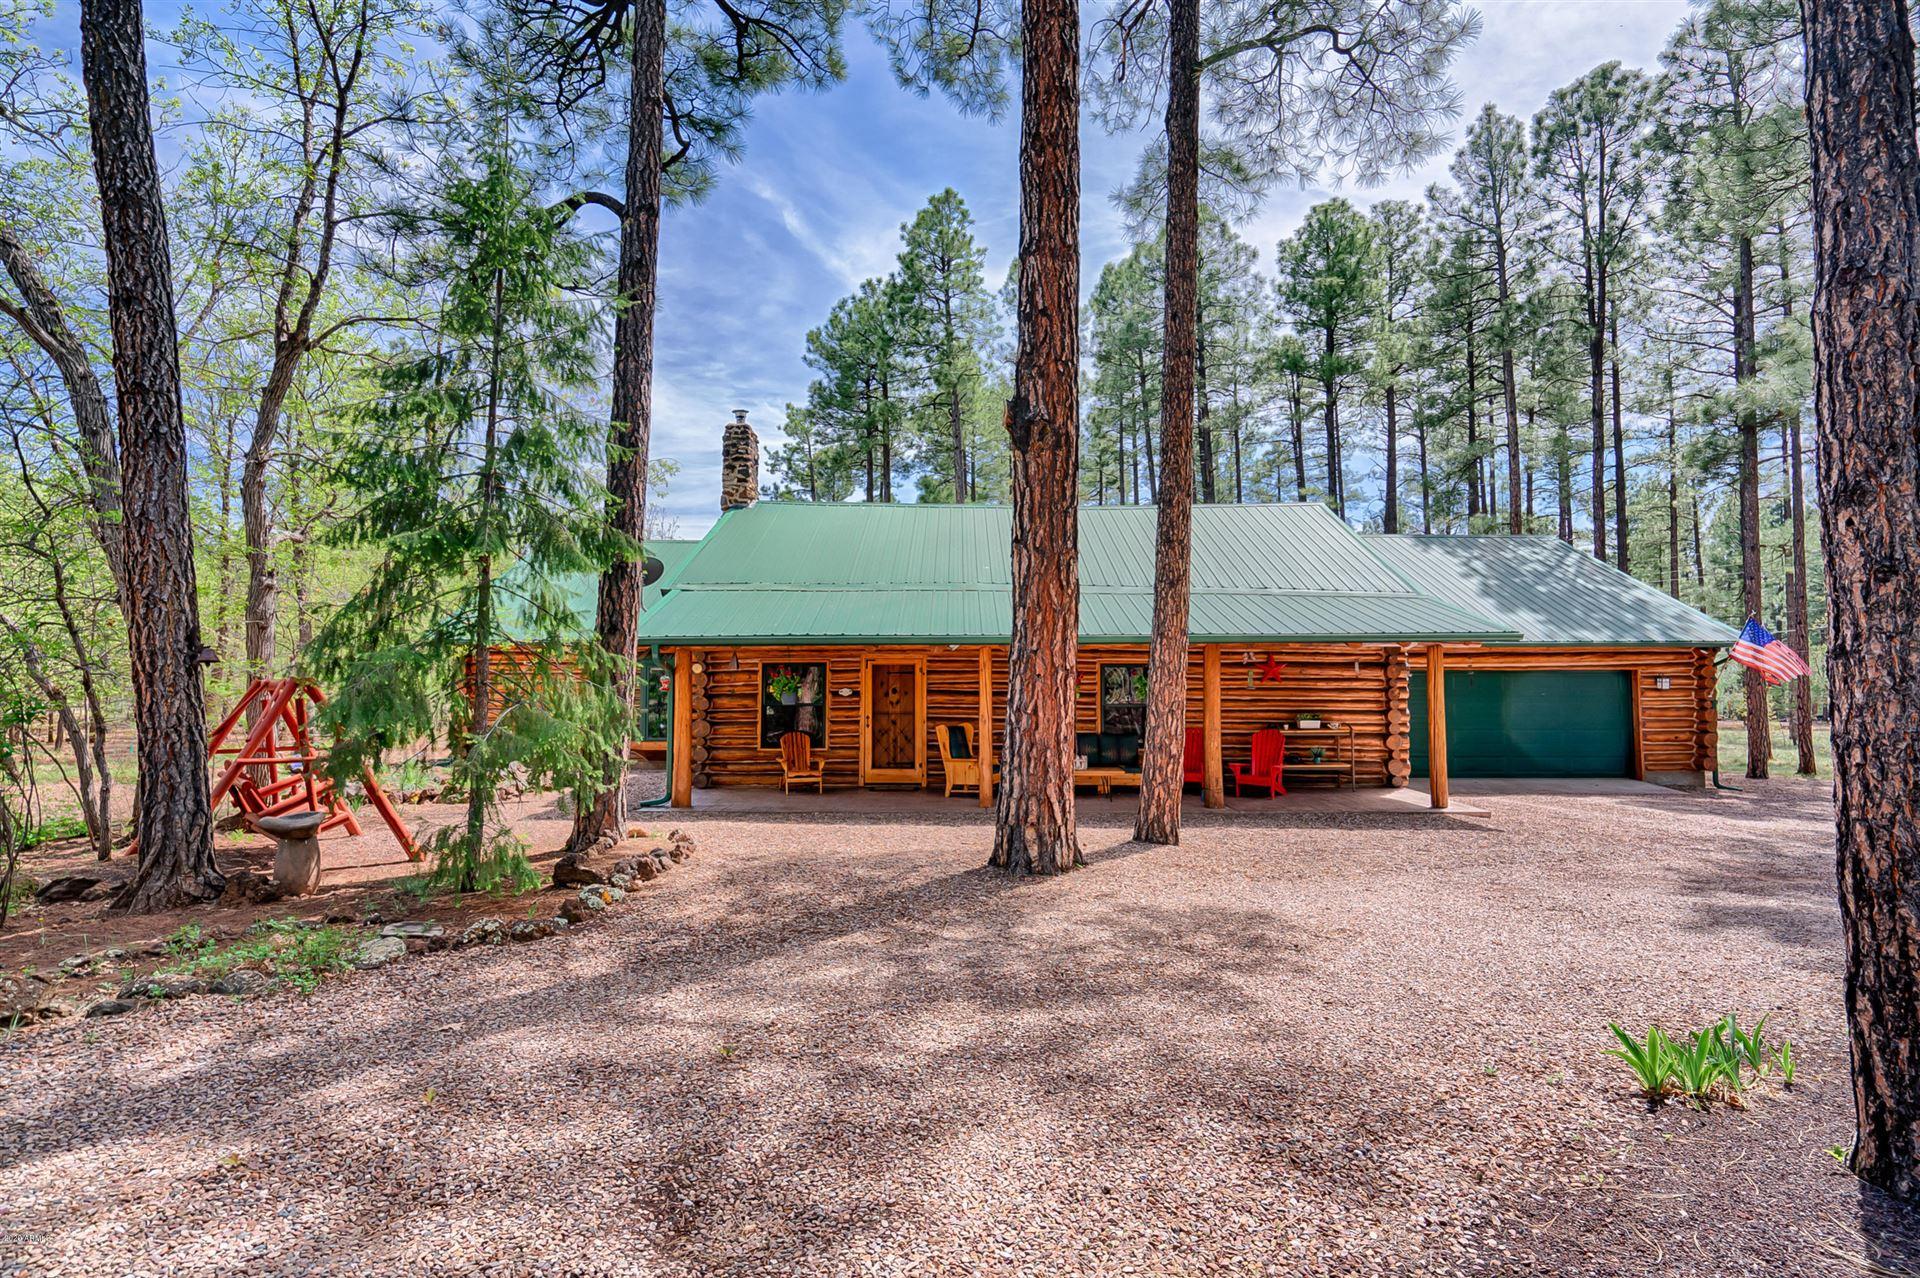 Property Image Of Lot 21 Lakeside Sumer Homes -- In Pinetop Lakeside, Az